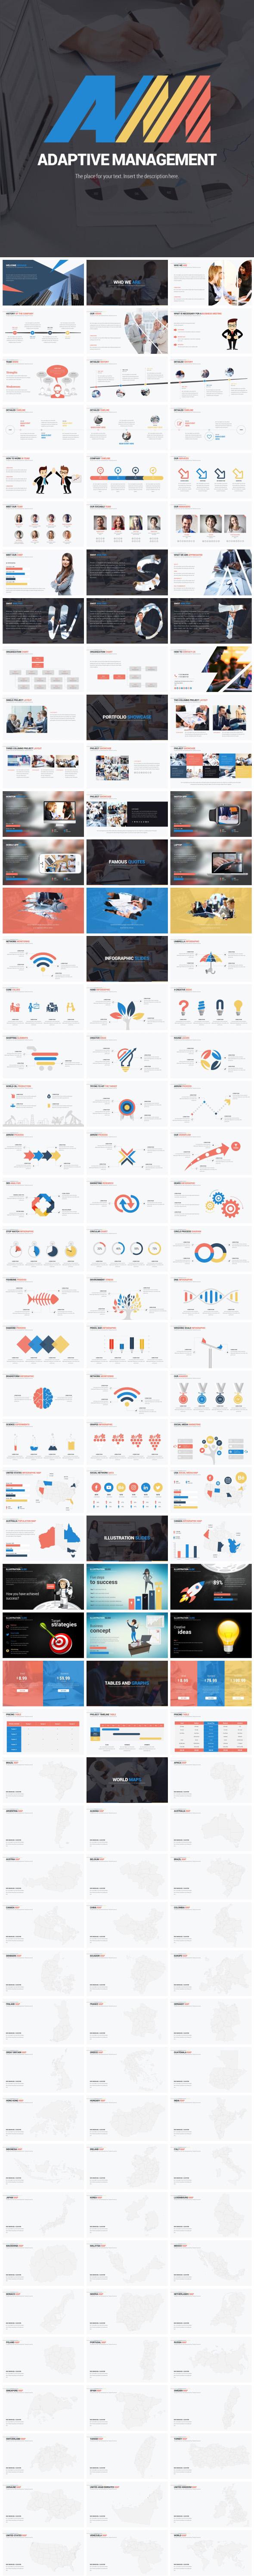 Adaptive Management - Google Slides Presentation Templates